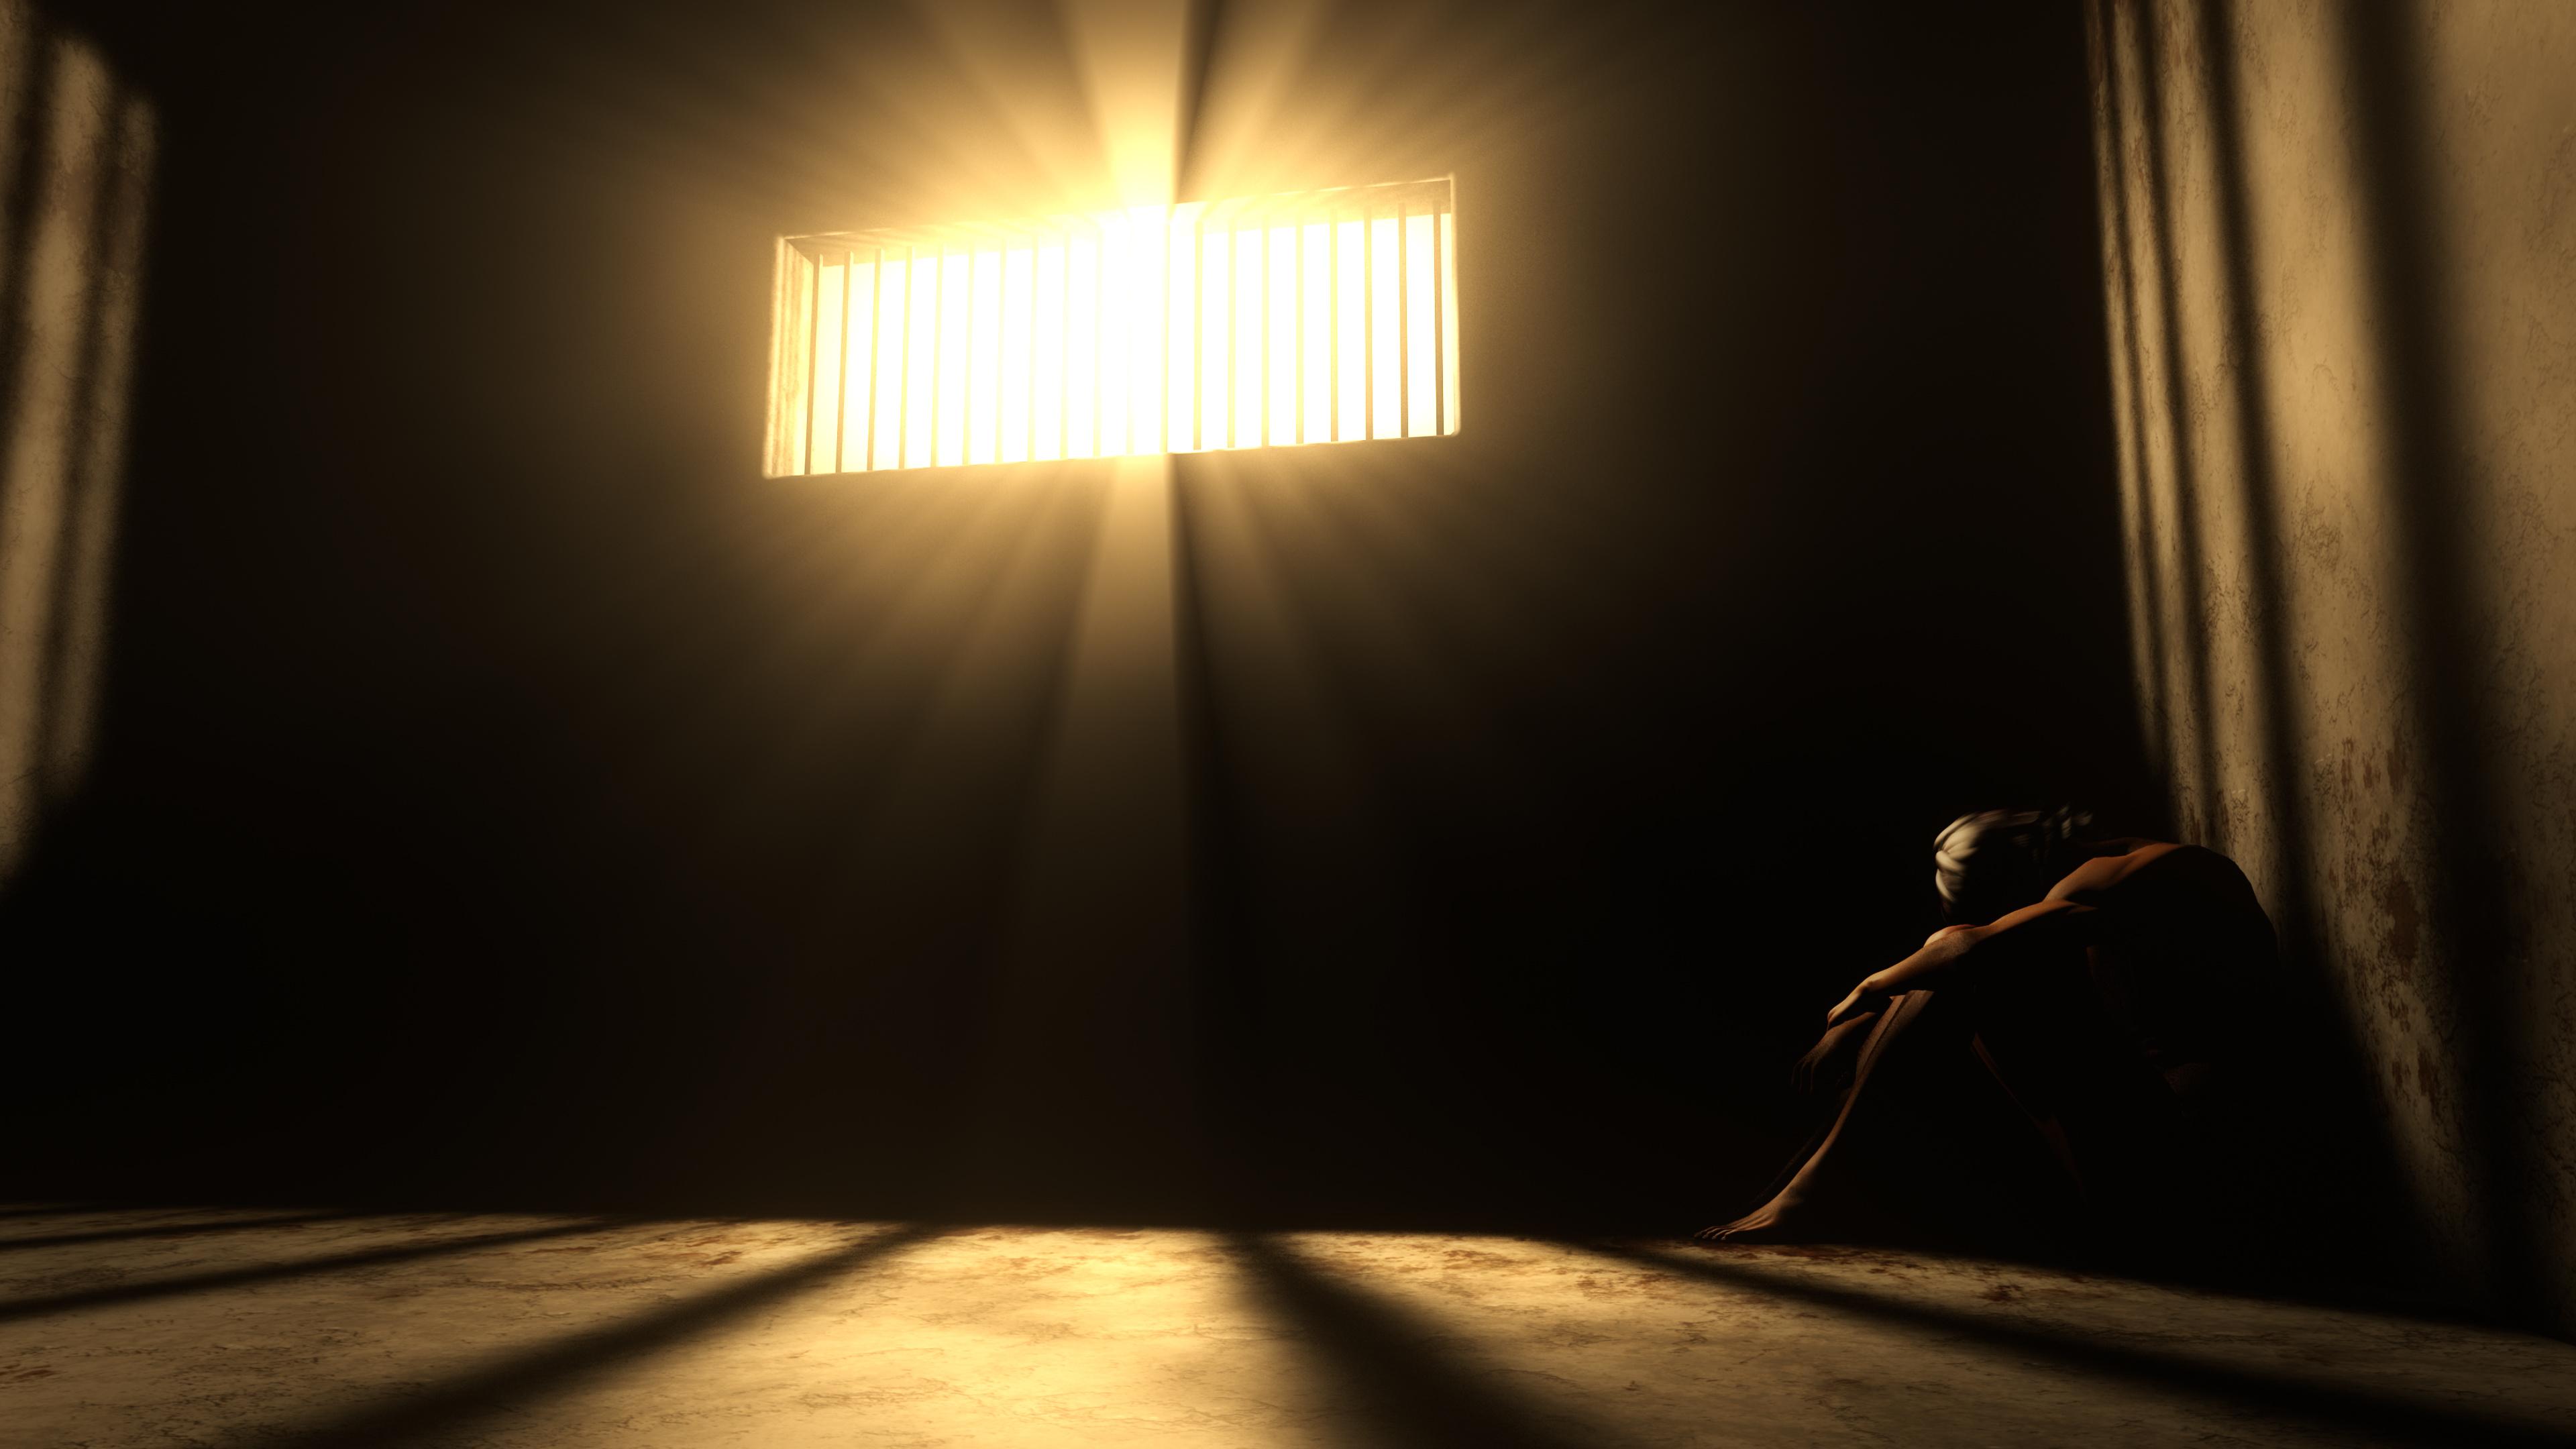 TESTIMONY: FREEDOM IN PRISON